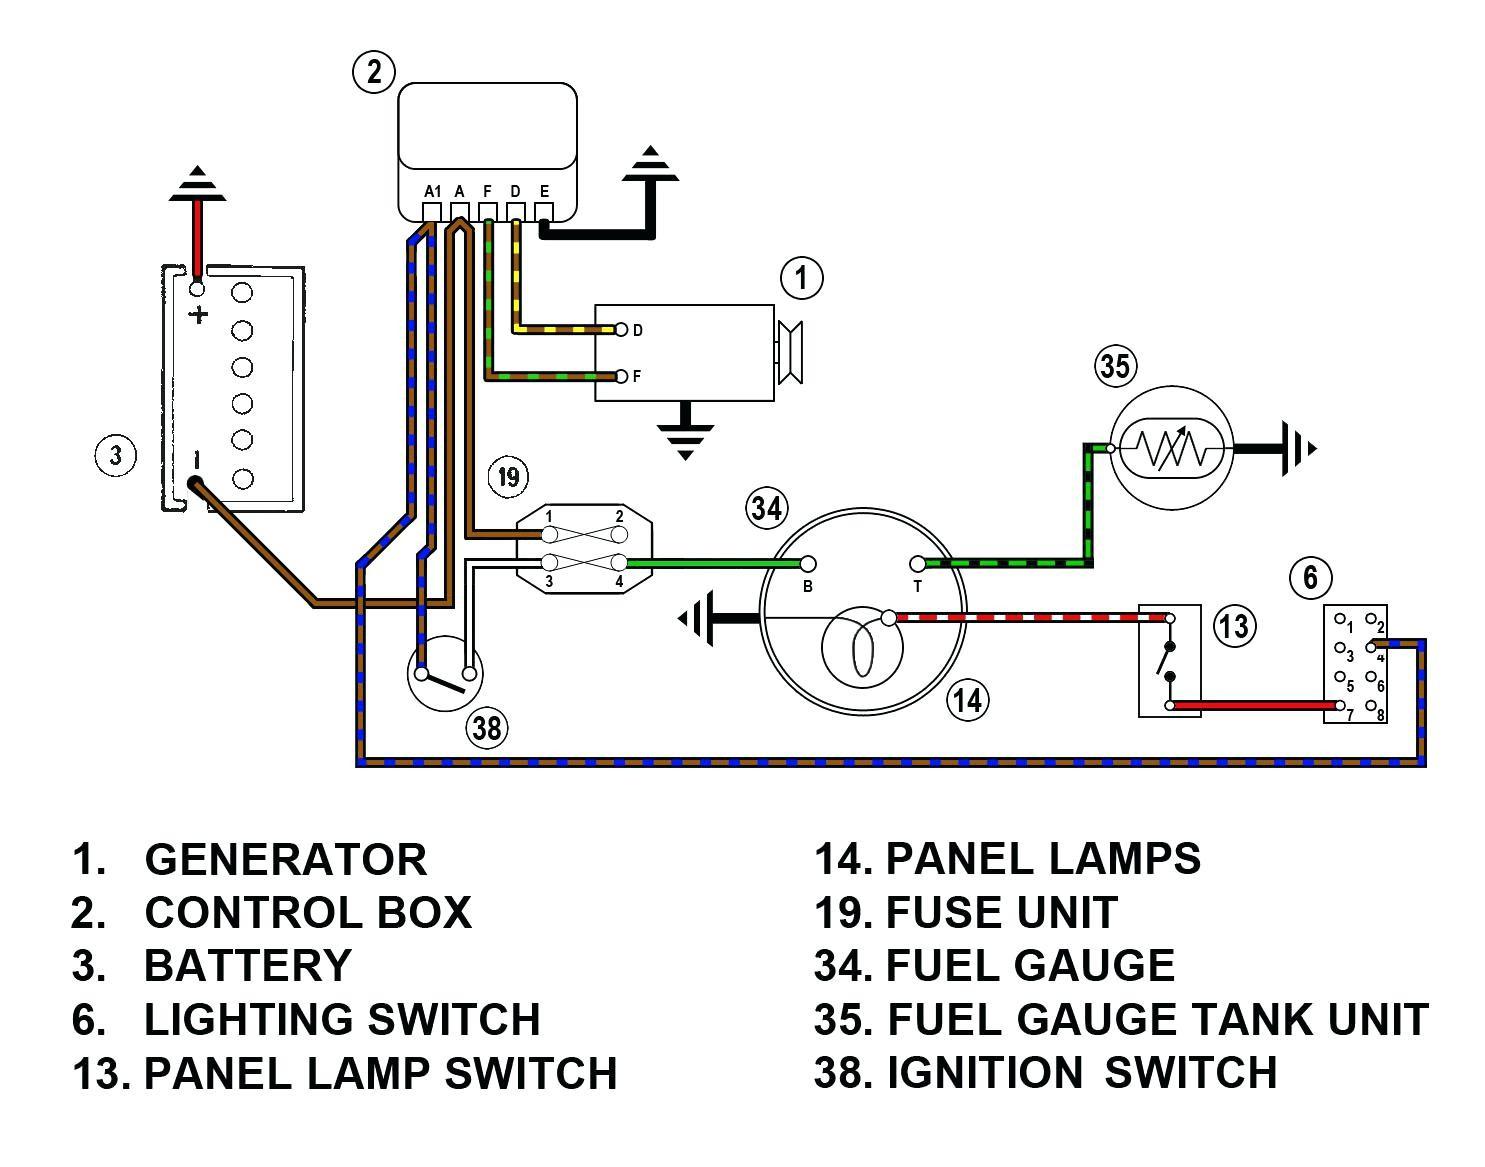 fuel tank selector switch wiring diagram best of gm fuel sending